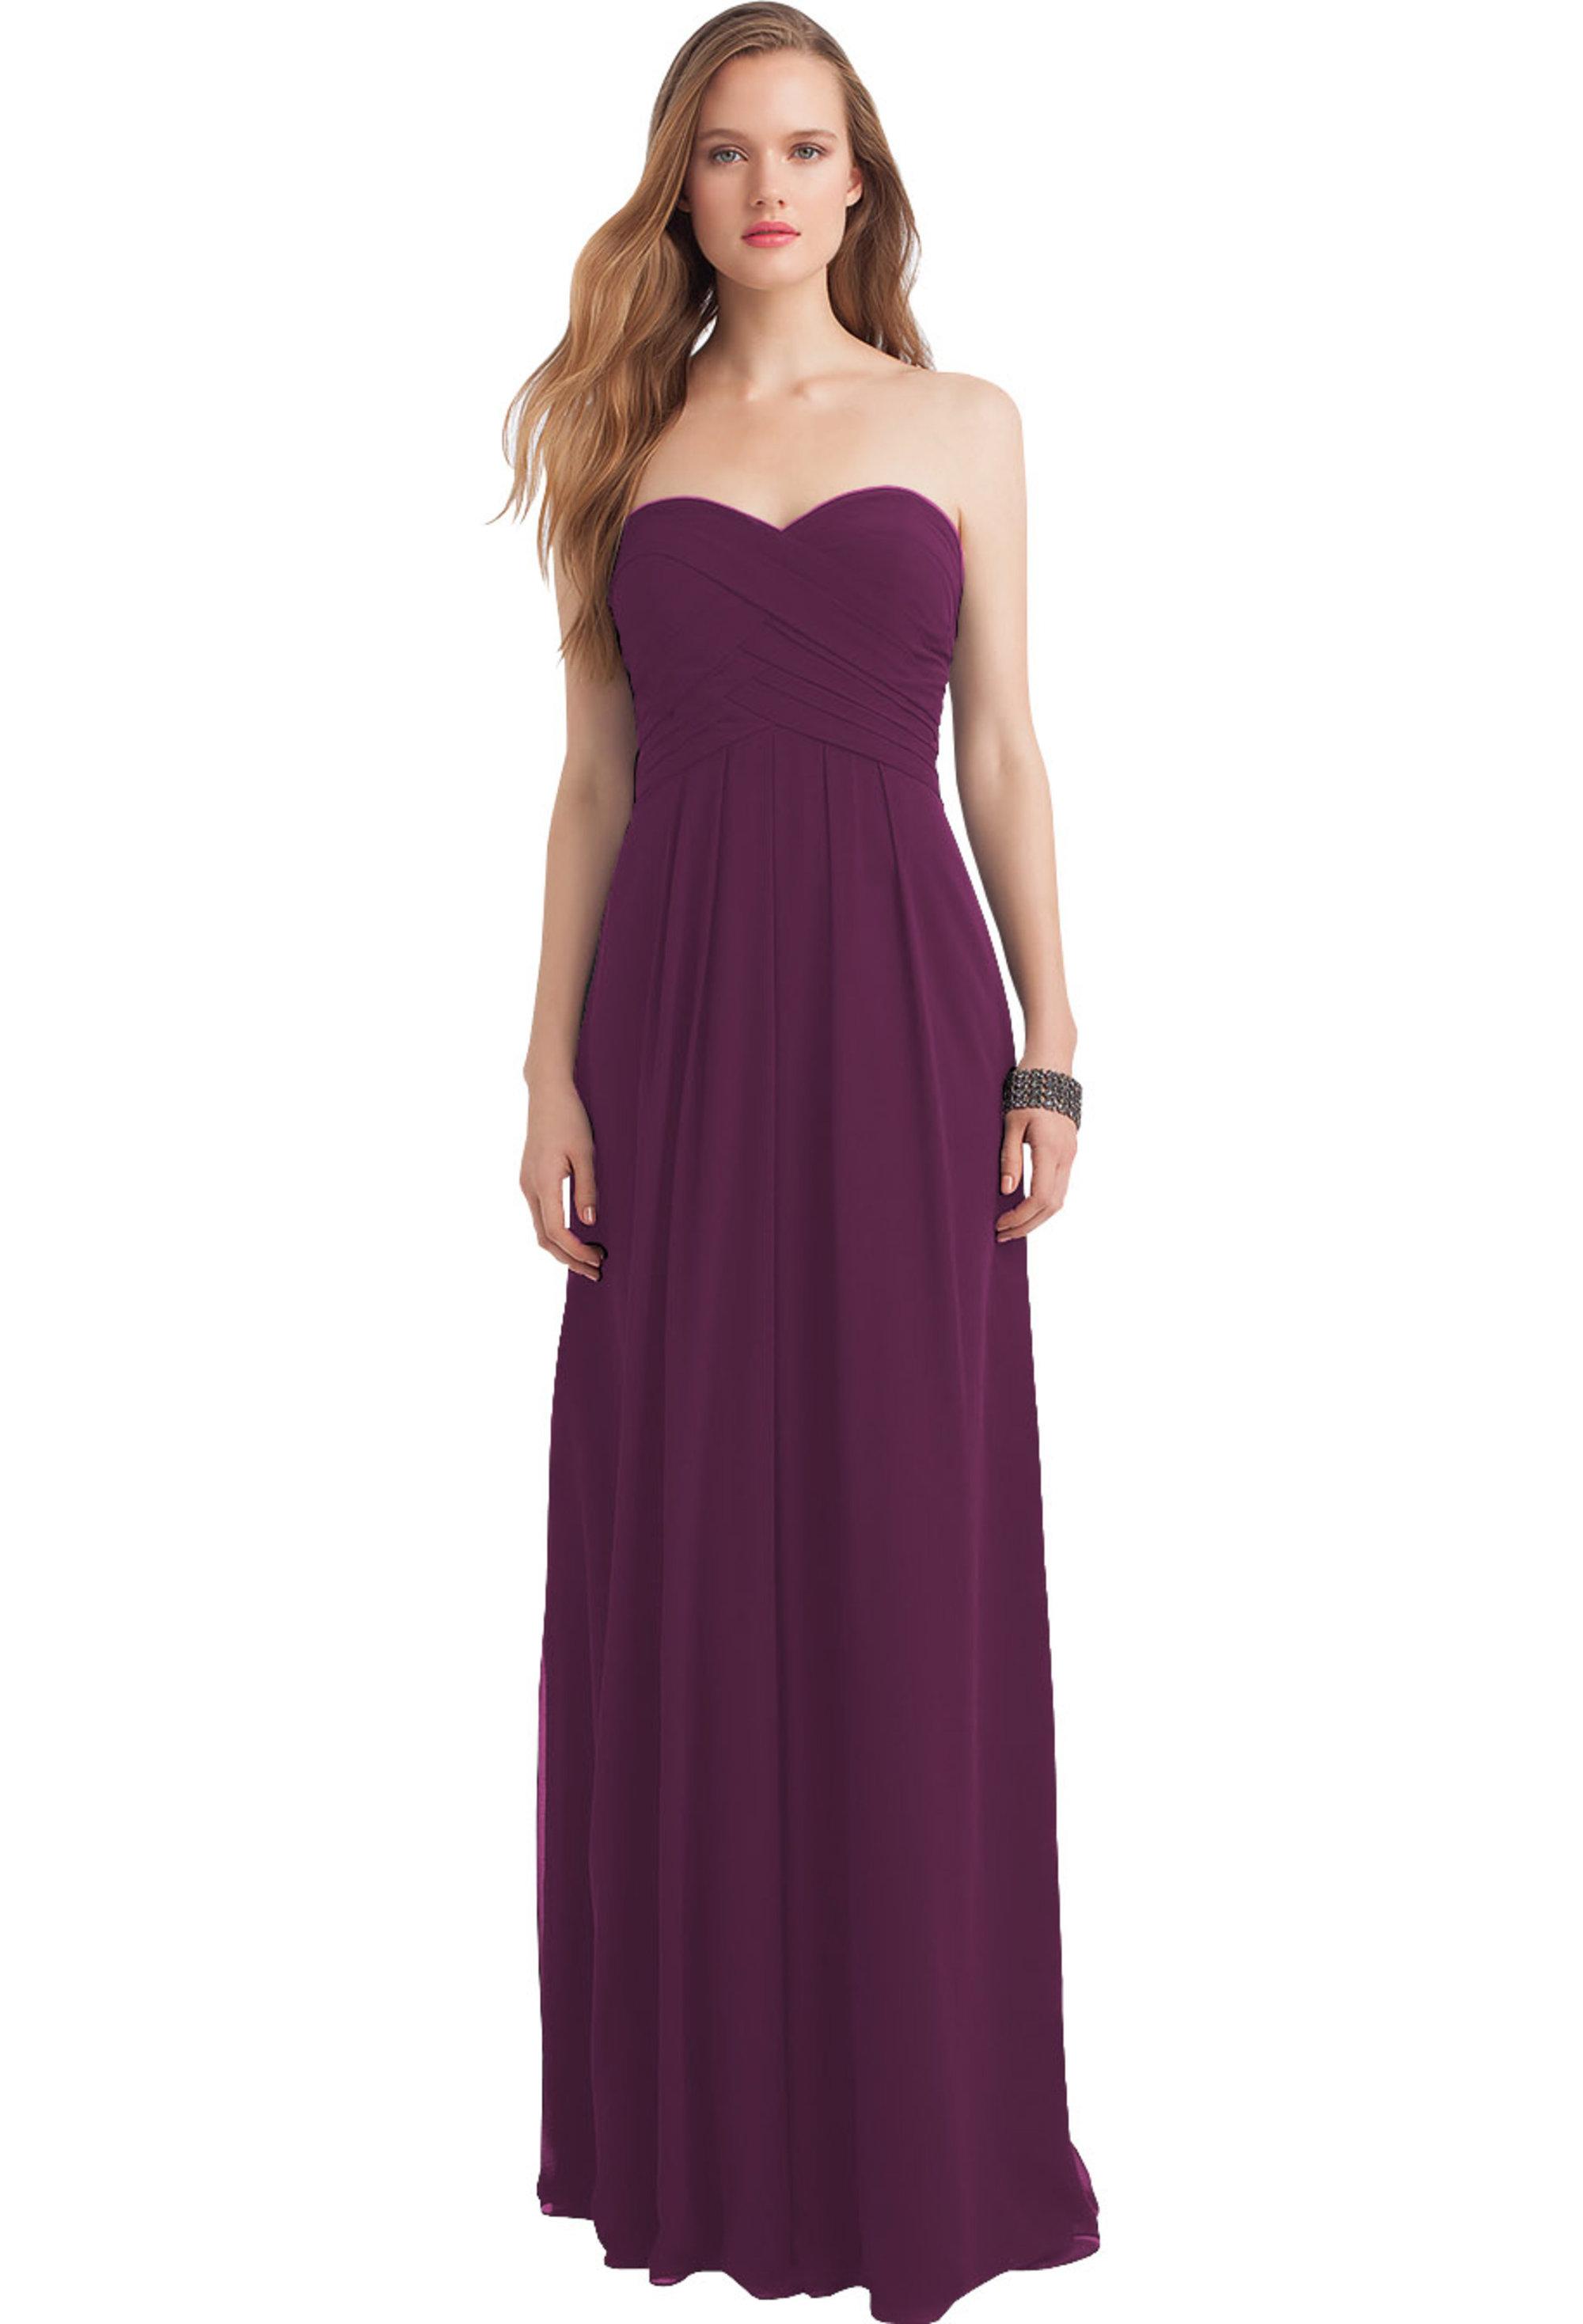 Bill Levkoff EGGPLANT Chiffon Sweetheart Floor Length gown, $216.00 Front